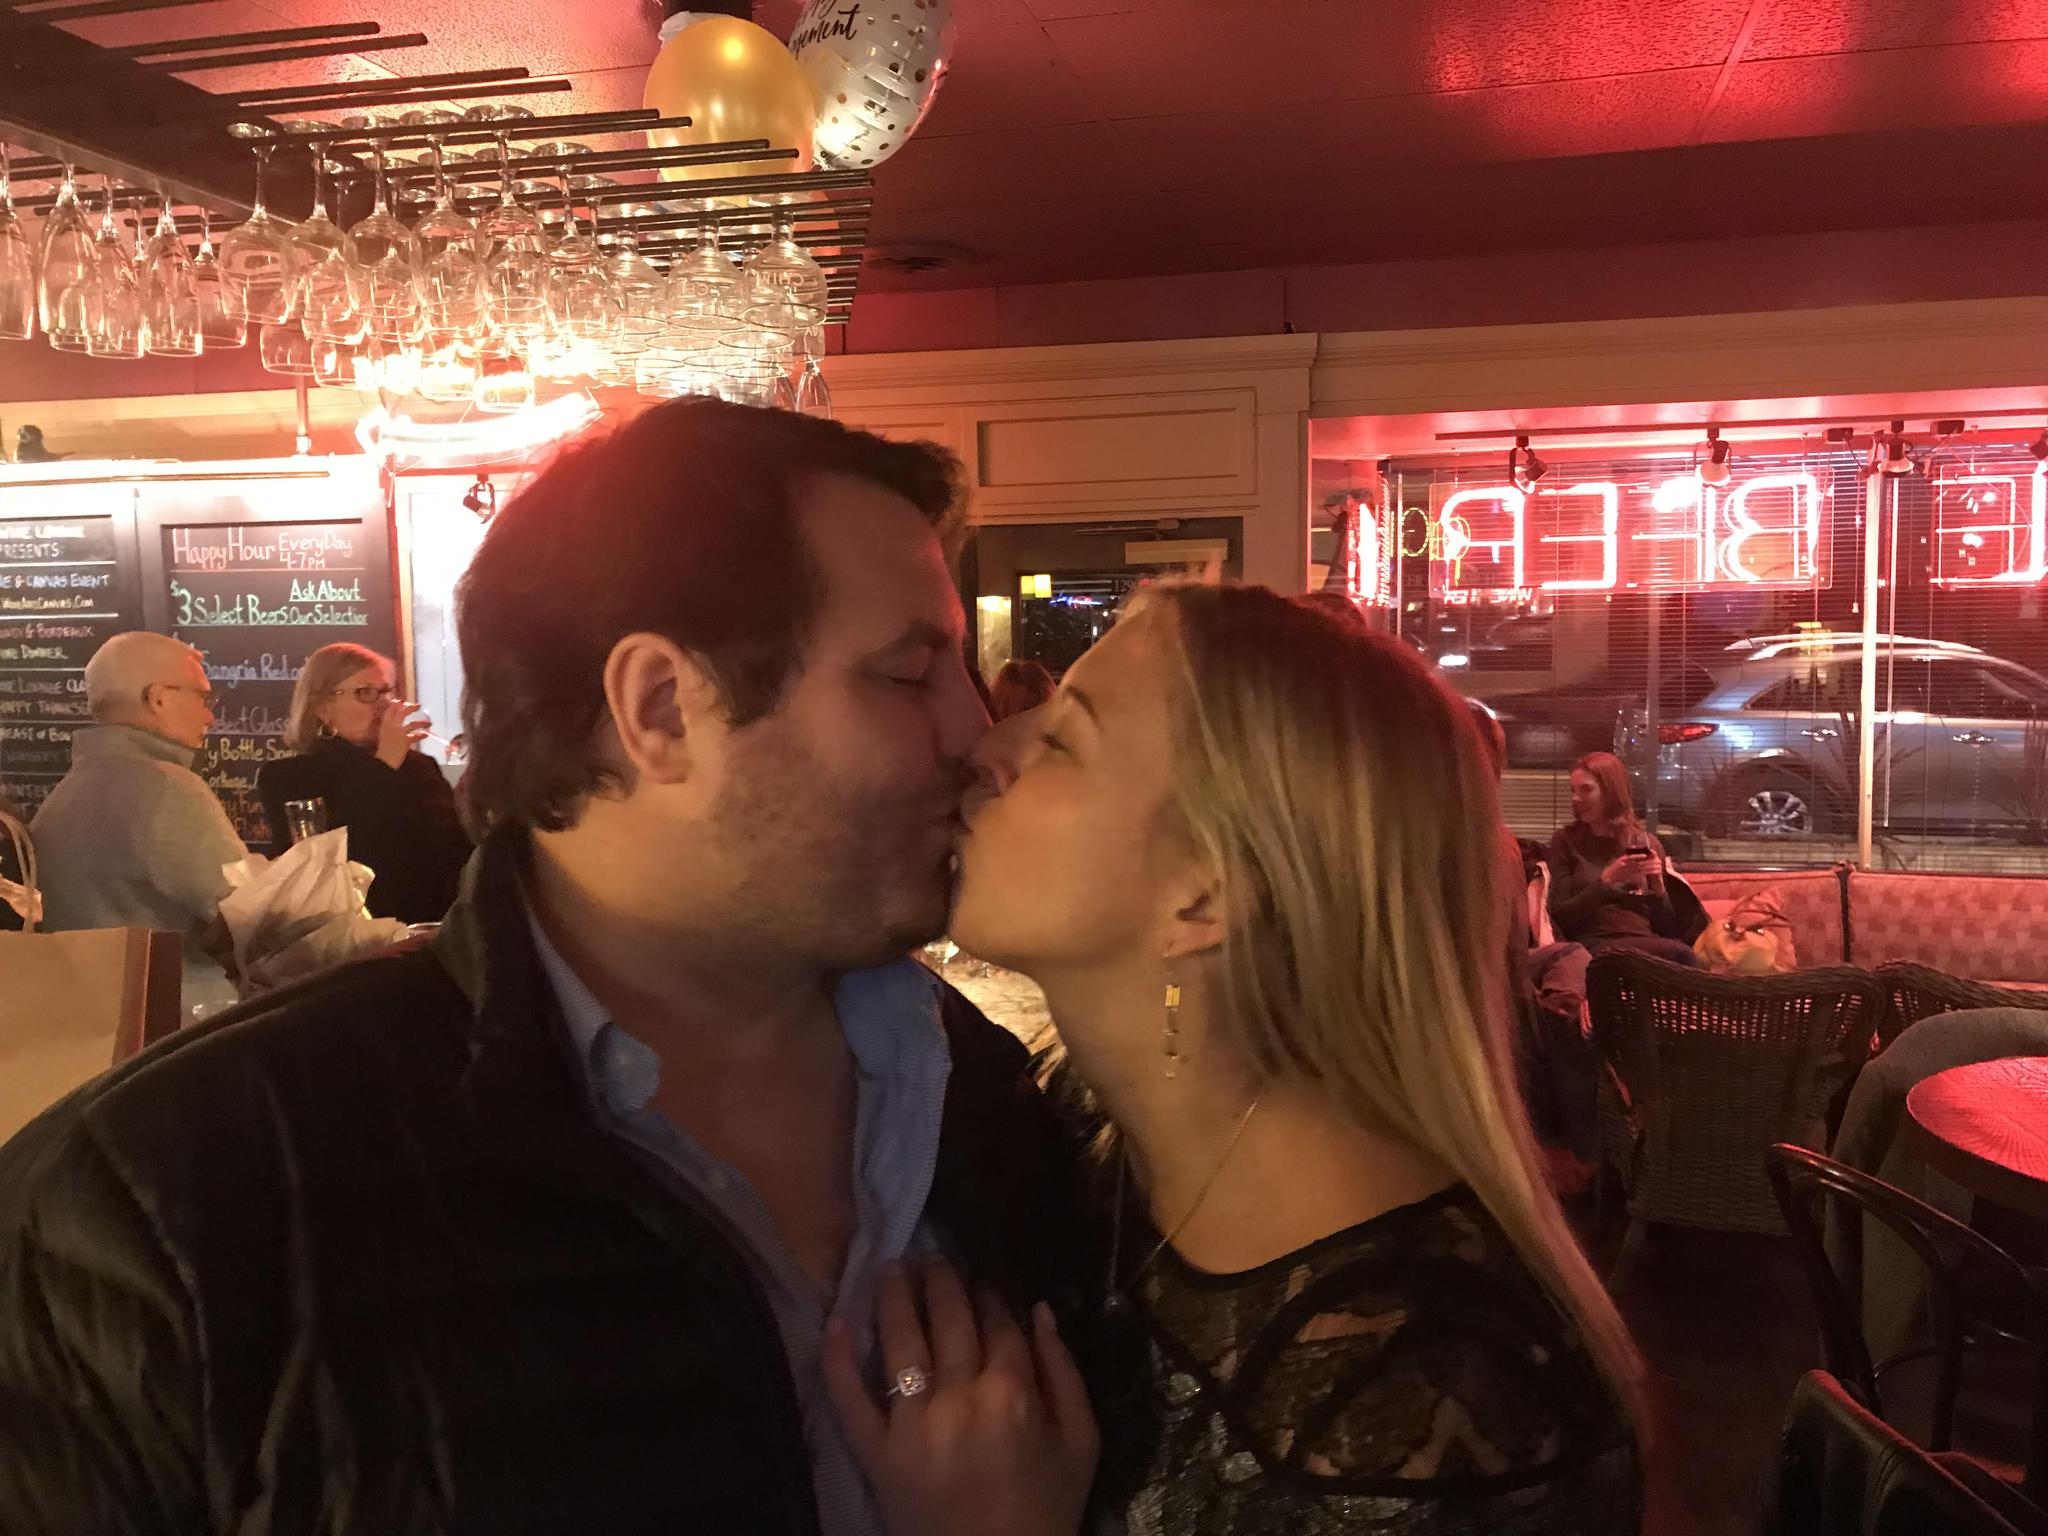 Engagement night at Spagio Wine Cellar  sc 1 st  Katie Davis u0026 Richard Spence & Katie Davis u0026 Richard Spence u2014 Minted